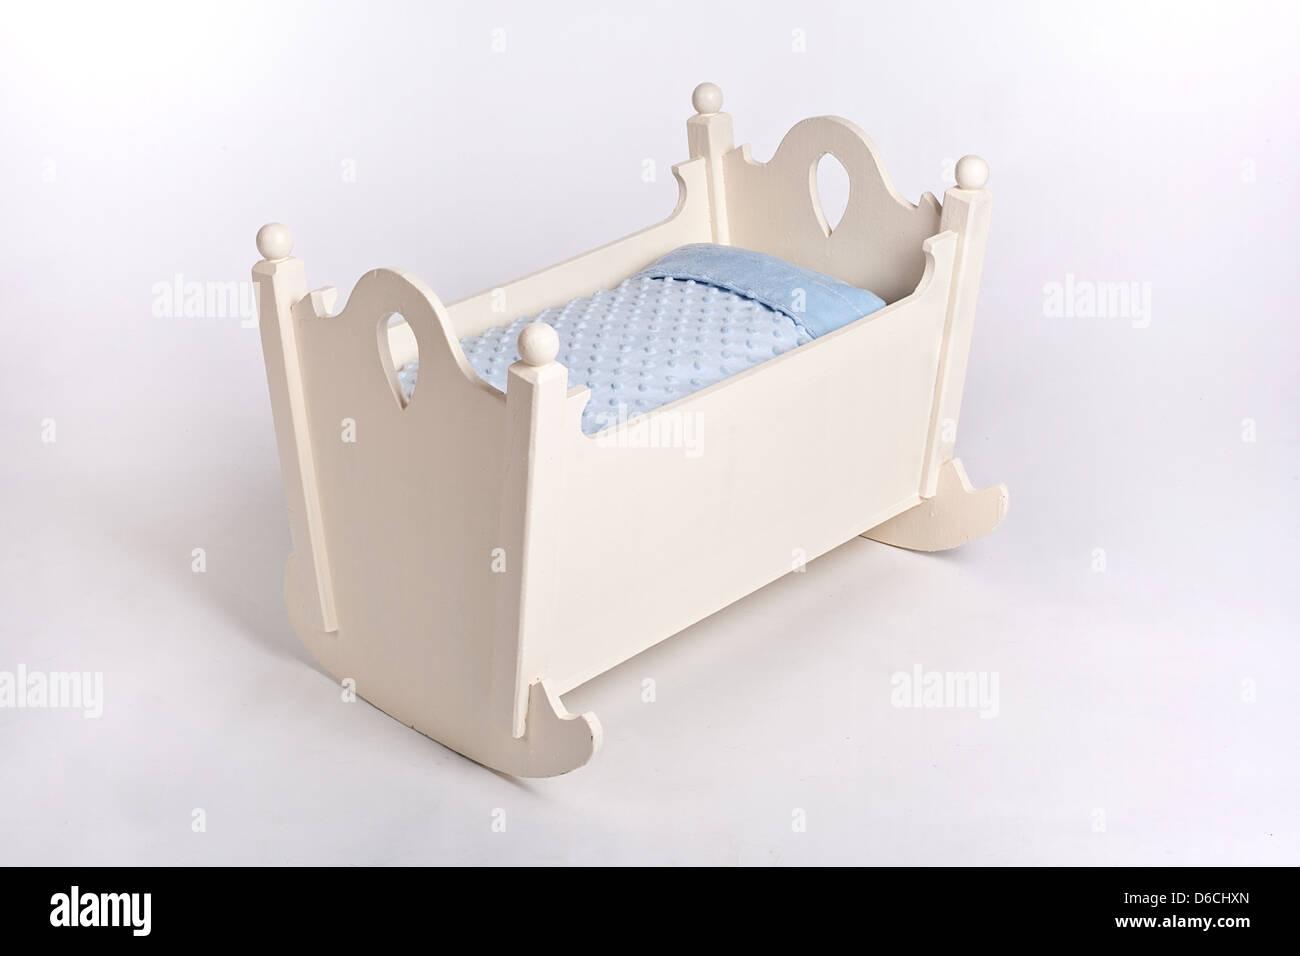 Babywiege bett stubenwagen schaukelwiege babybett eur